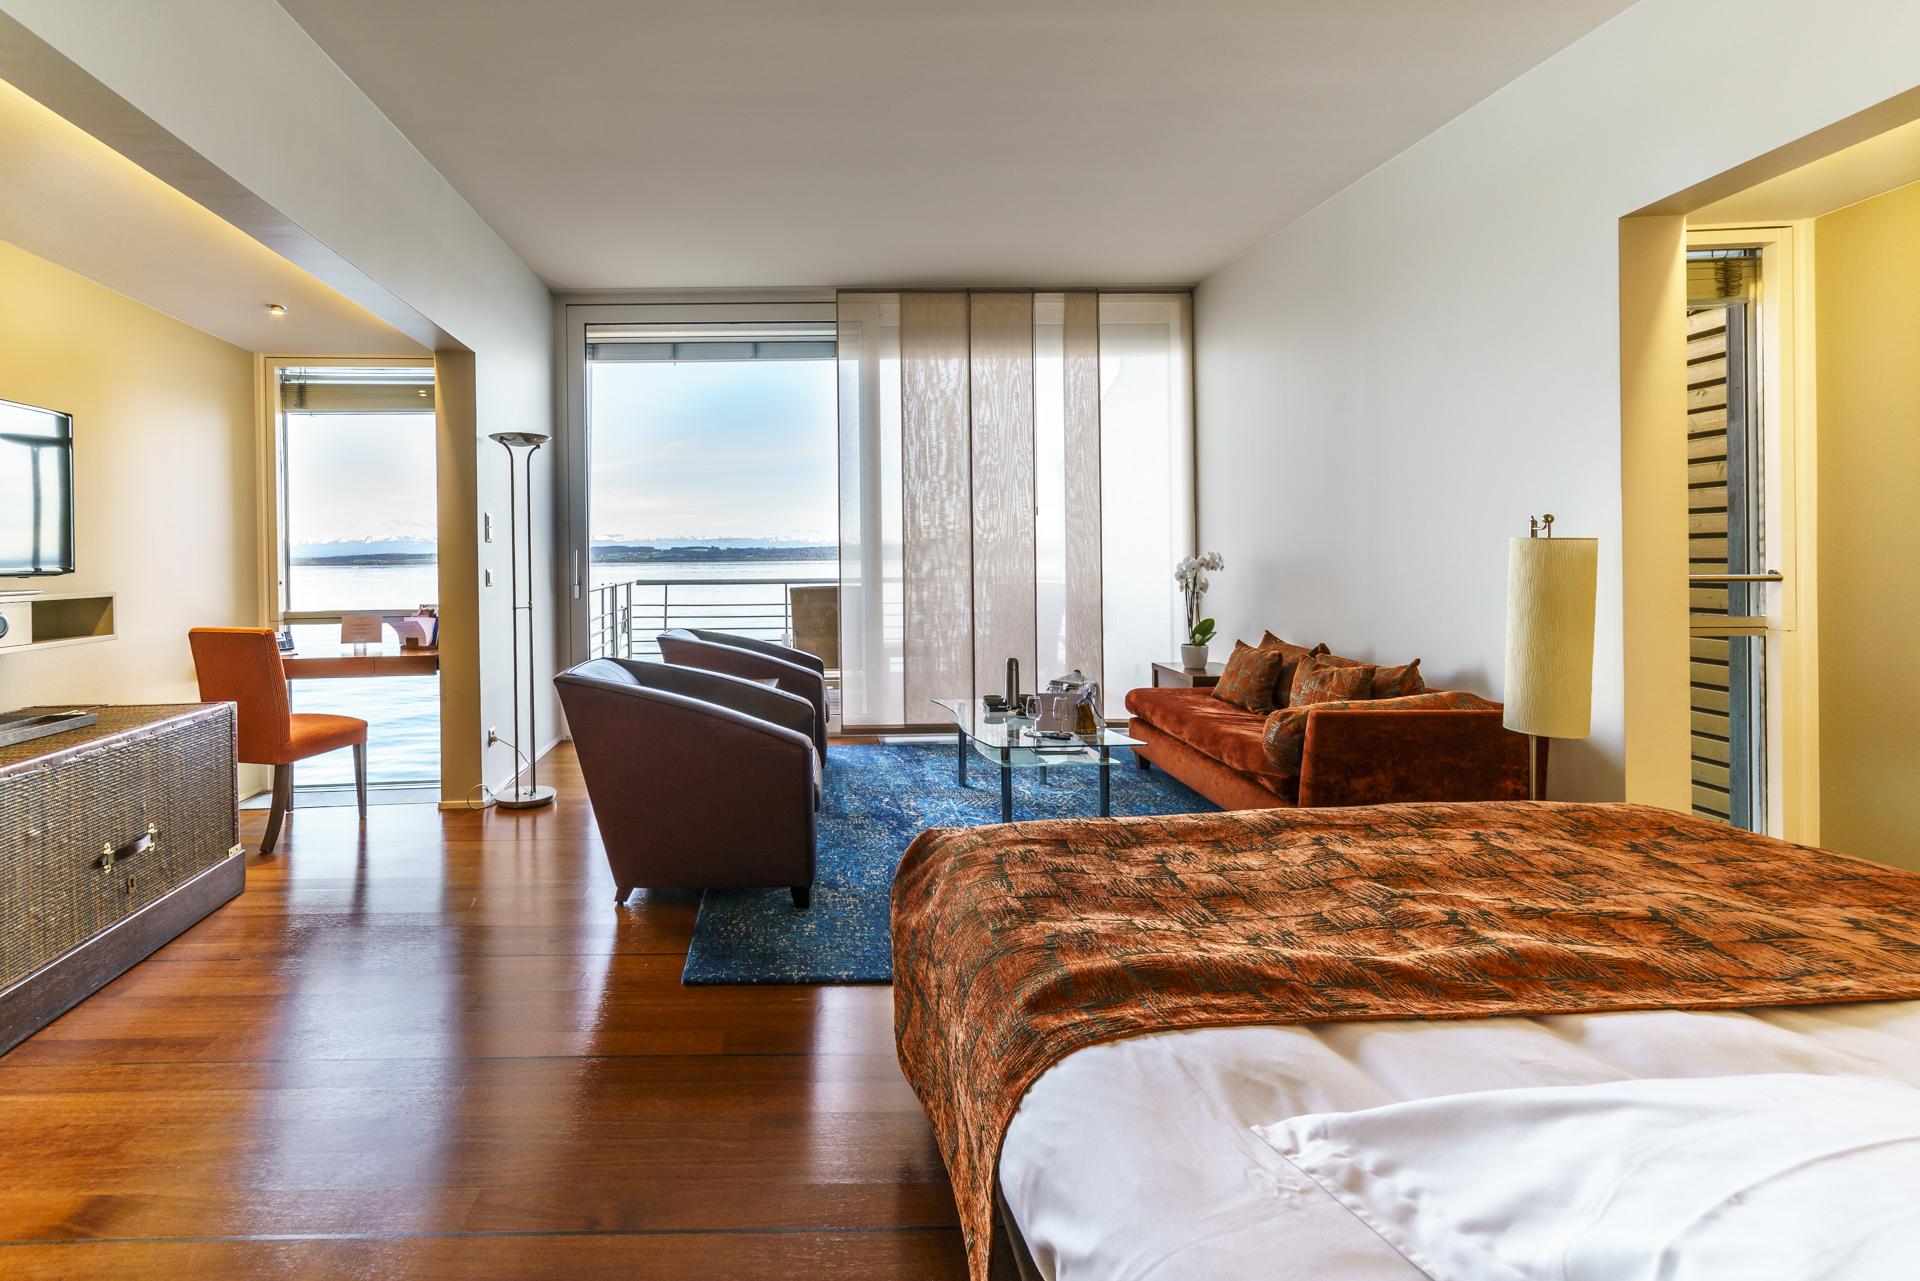 Hotel-Palafitte-lakeside-Bungalow-Zimmer-Aussicht